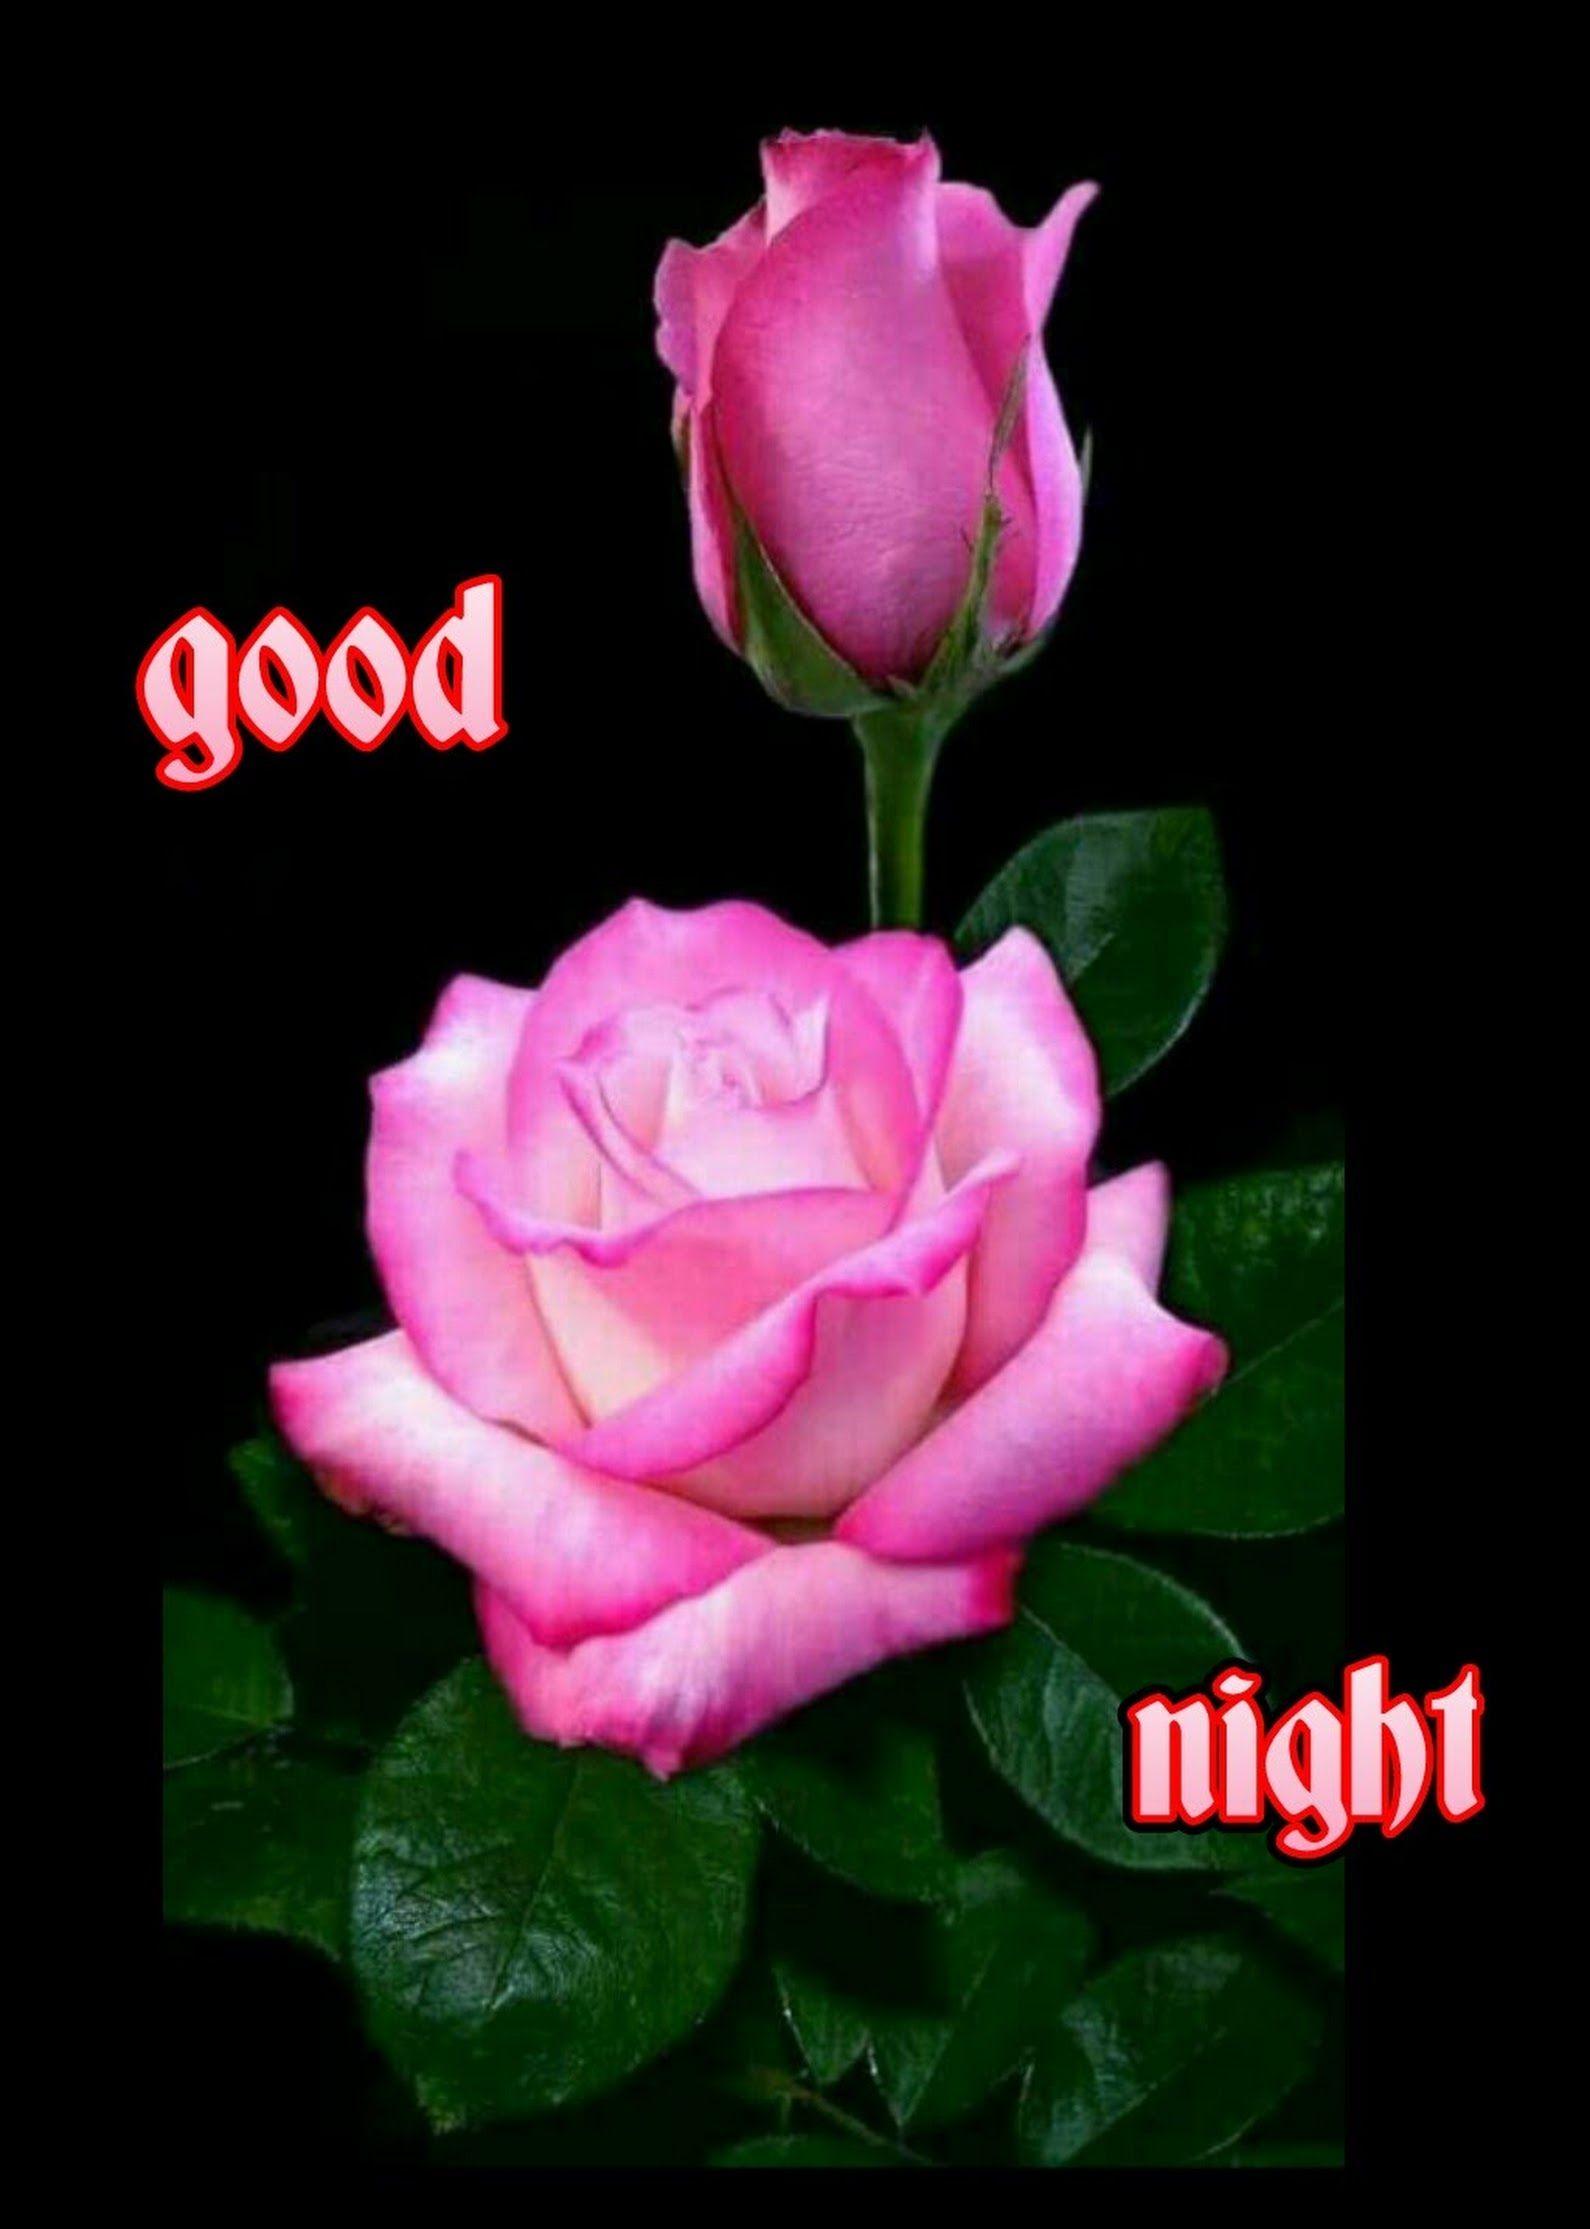 Good Night Kishor Ekatpure Google Beautiful Flowers And Roses